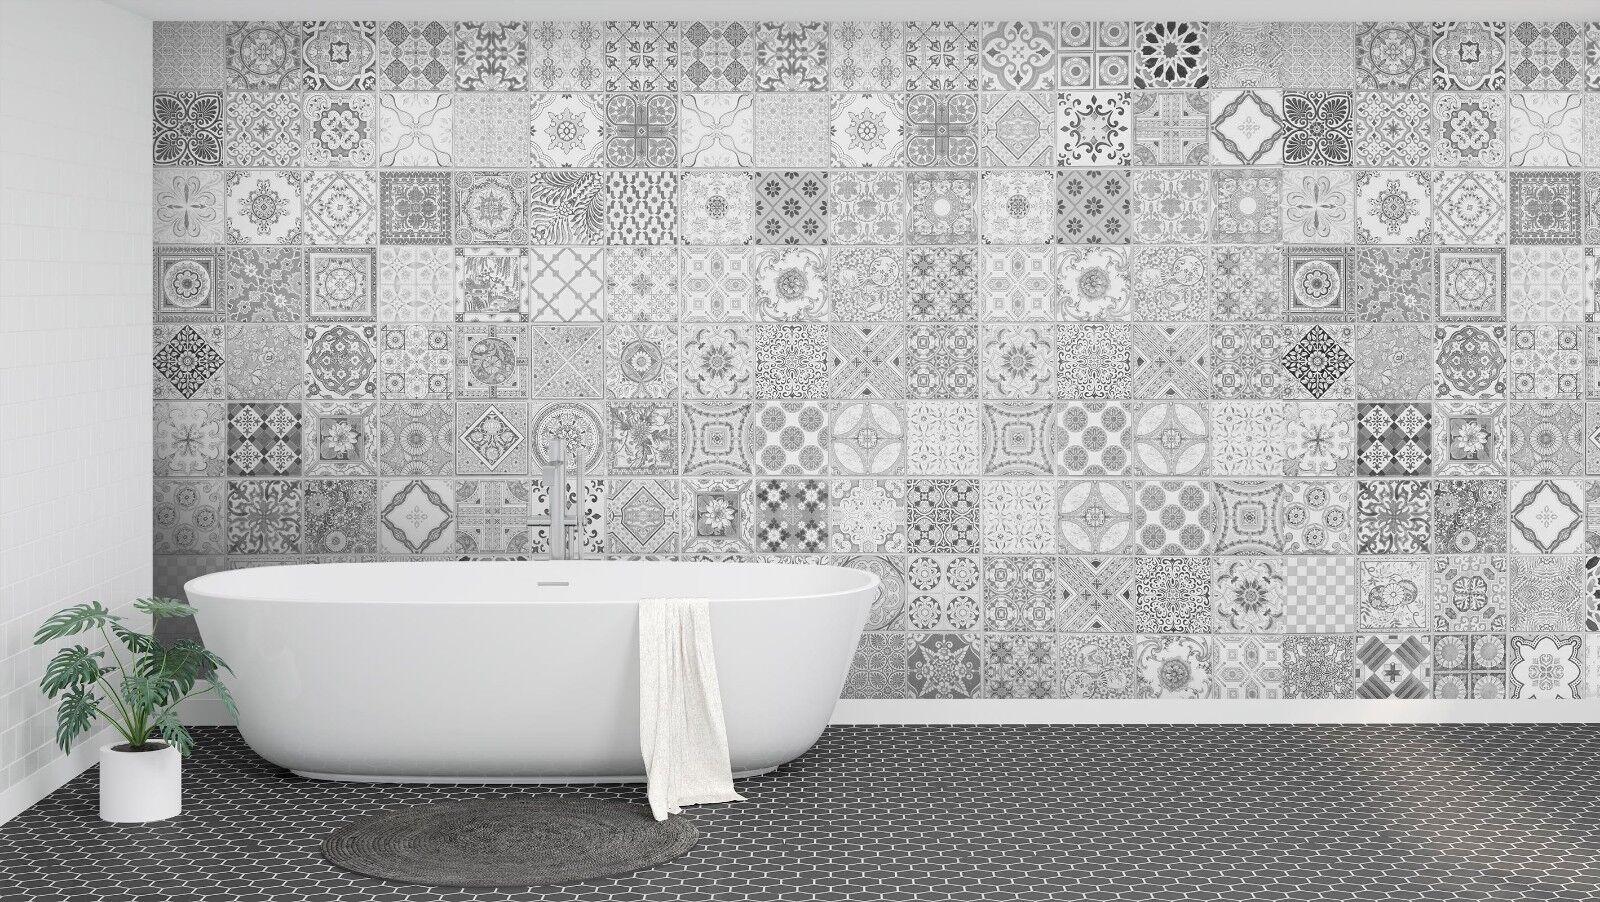 3D grey blueme Einfach 3 Textur Fliesen Marmor Tapeten Abziehbild Tapete Wandbild